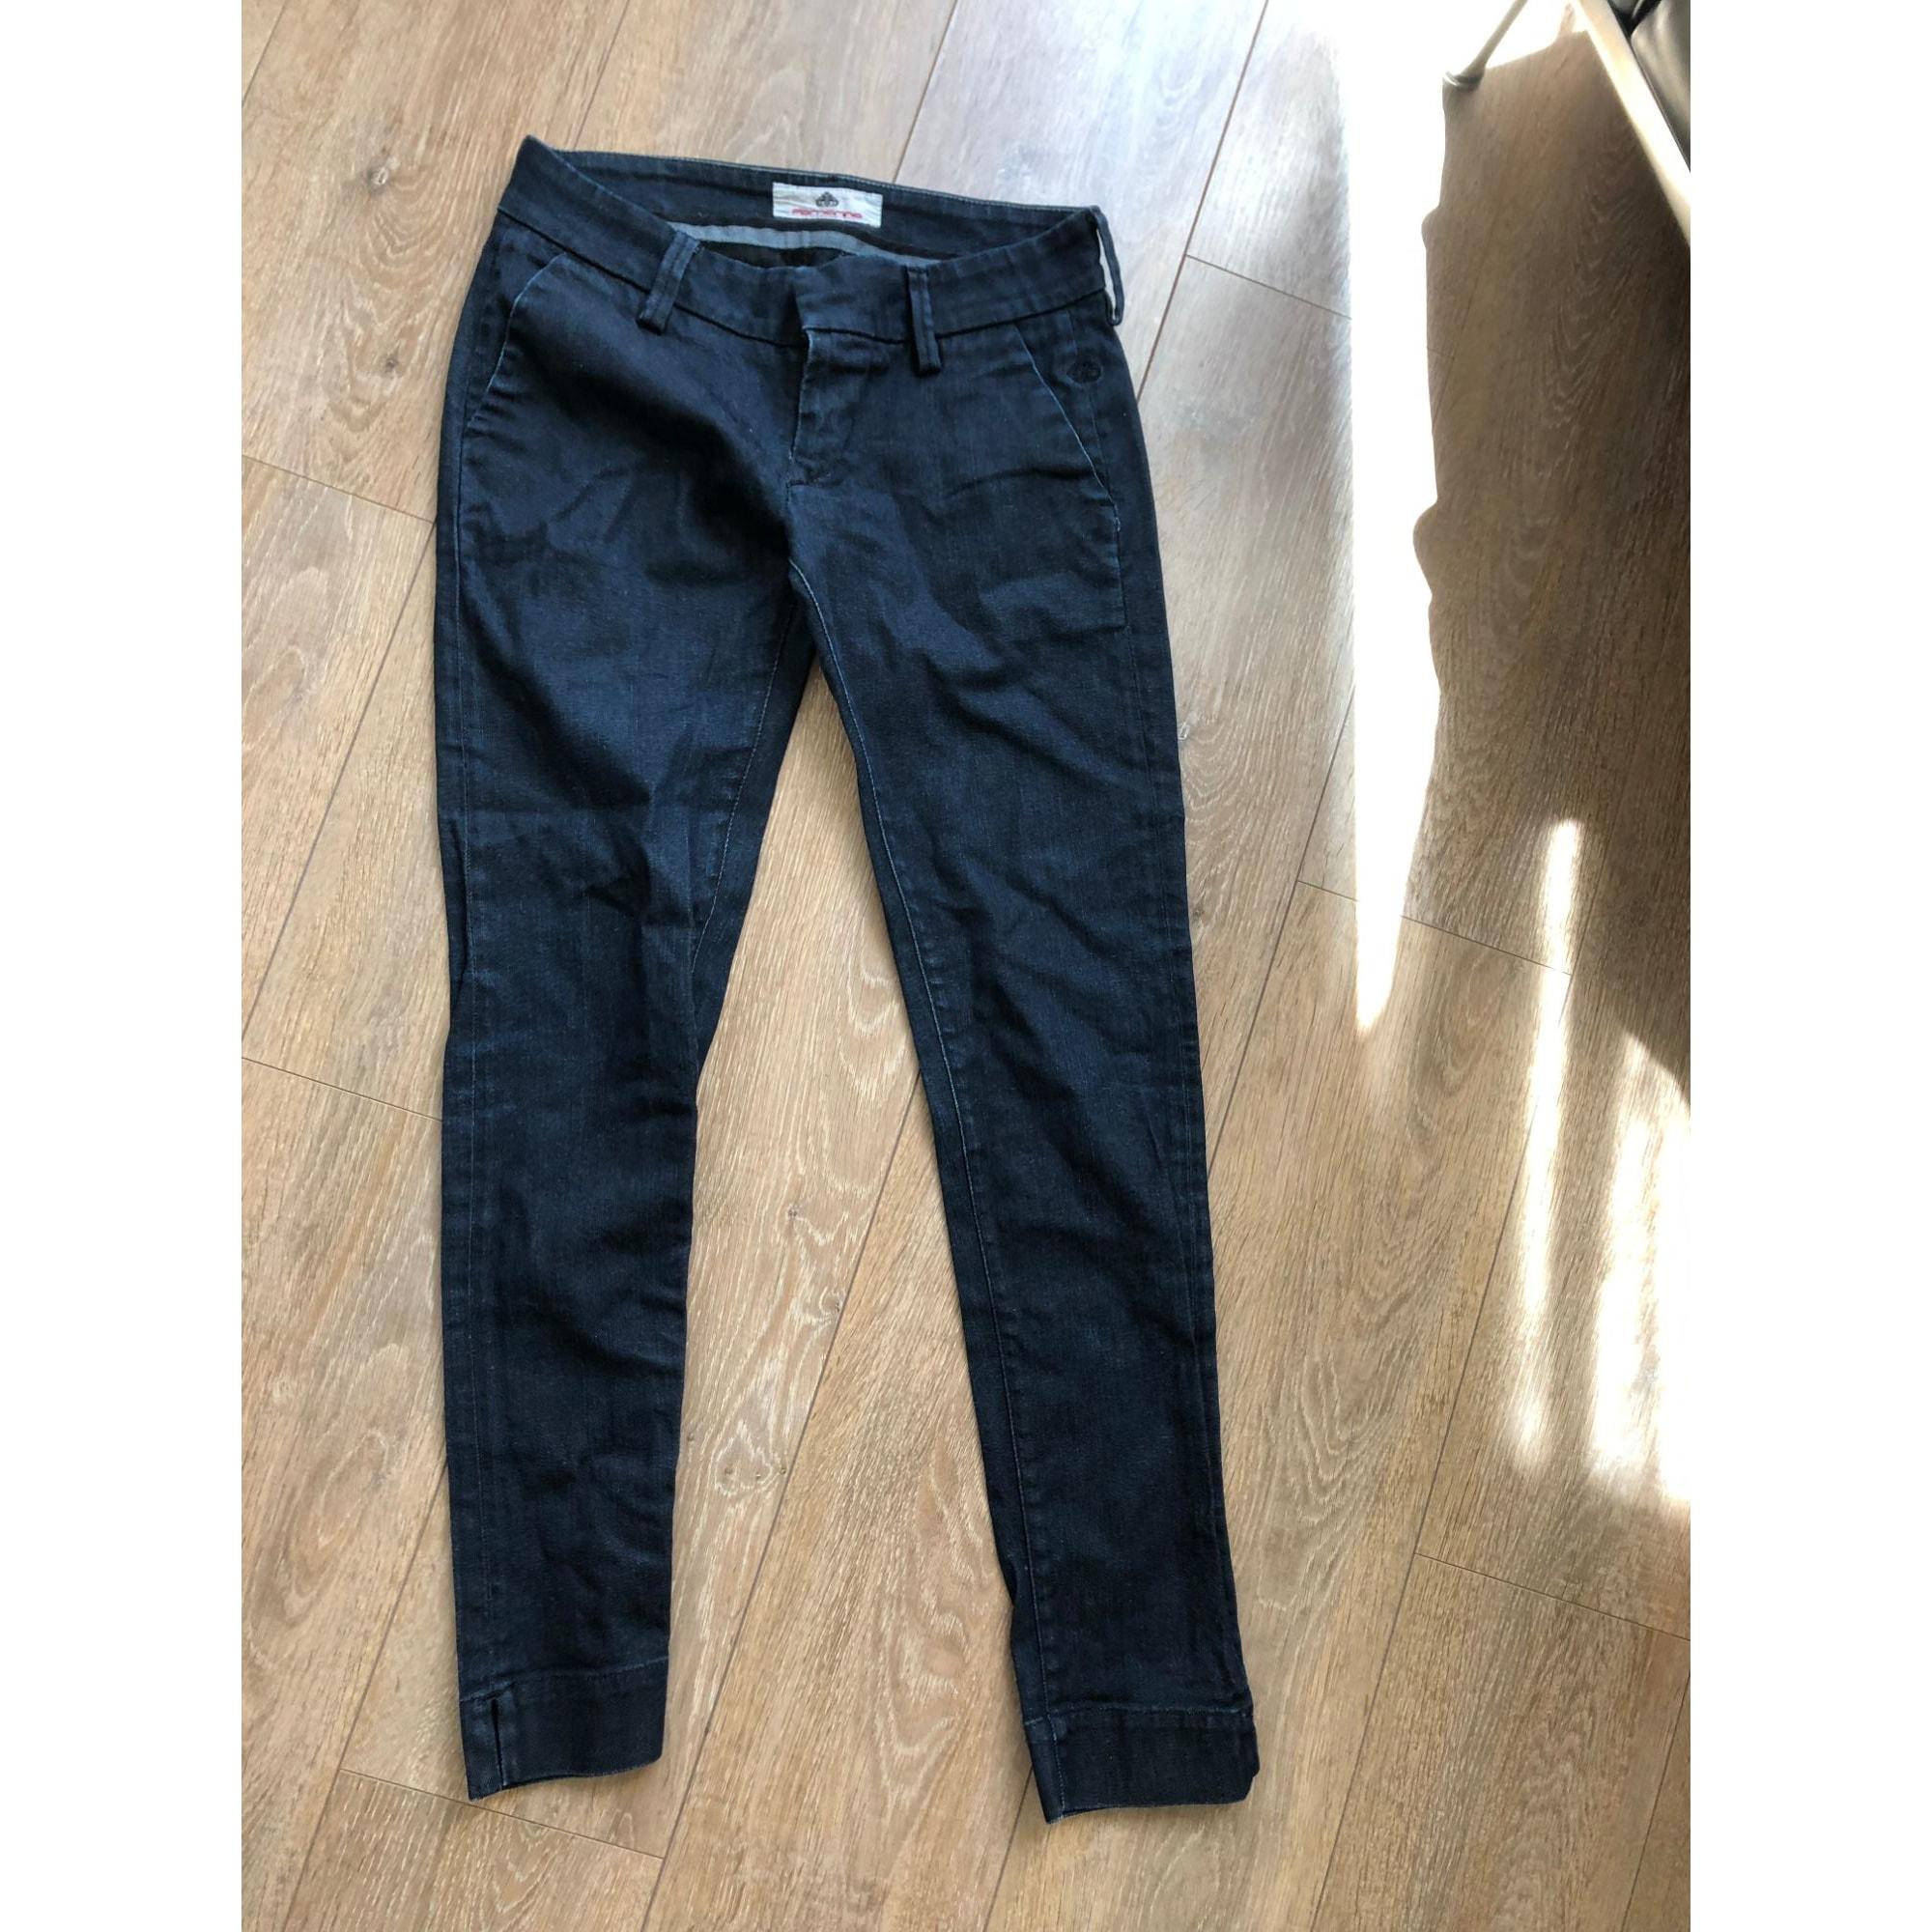 Jeans droit FORNARINA Bleu, bleu marine, bleu turquoise